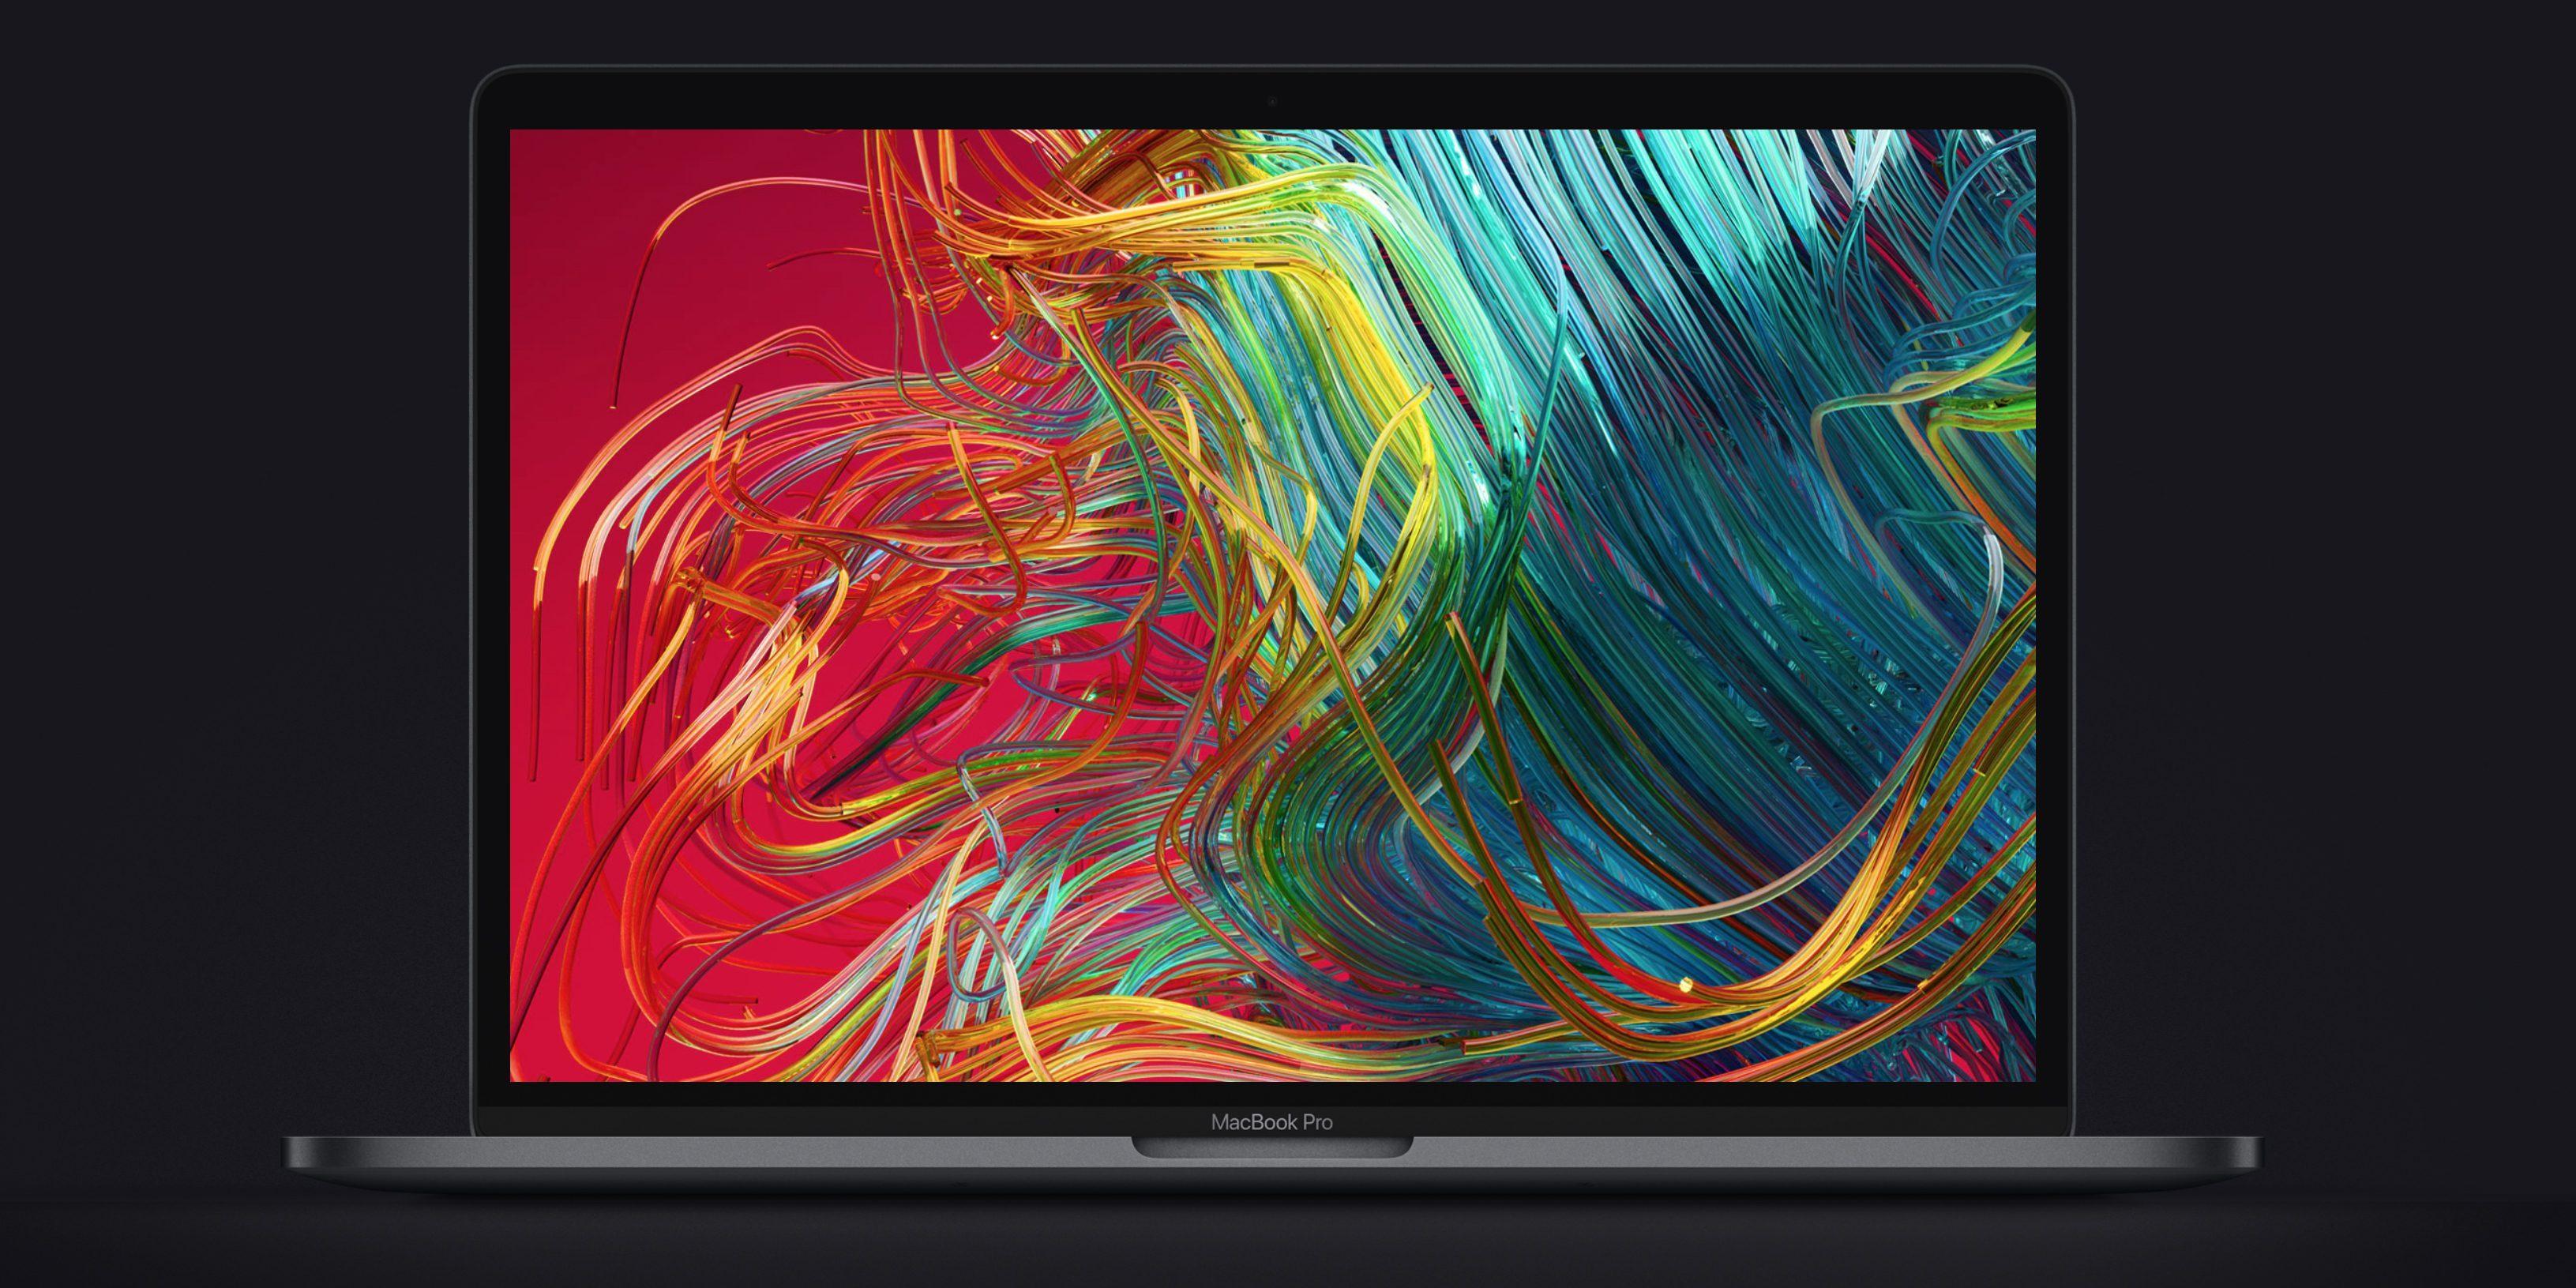 9to5Toys Lunch Break: $299 off MacBook Pro, TwelveSouth iPhone X Case $44, Jaybird Bluetooth Headphones $50, more